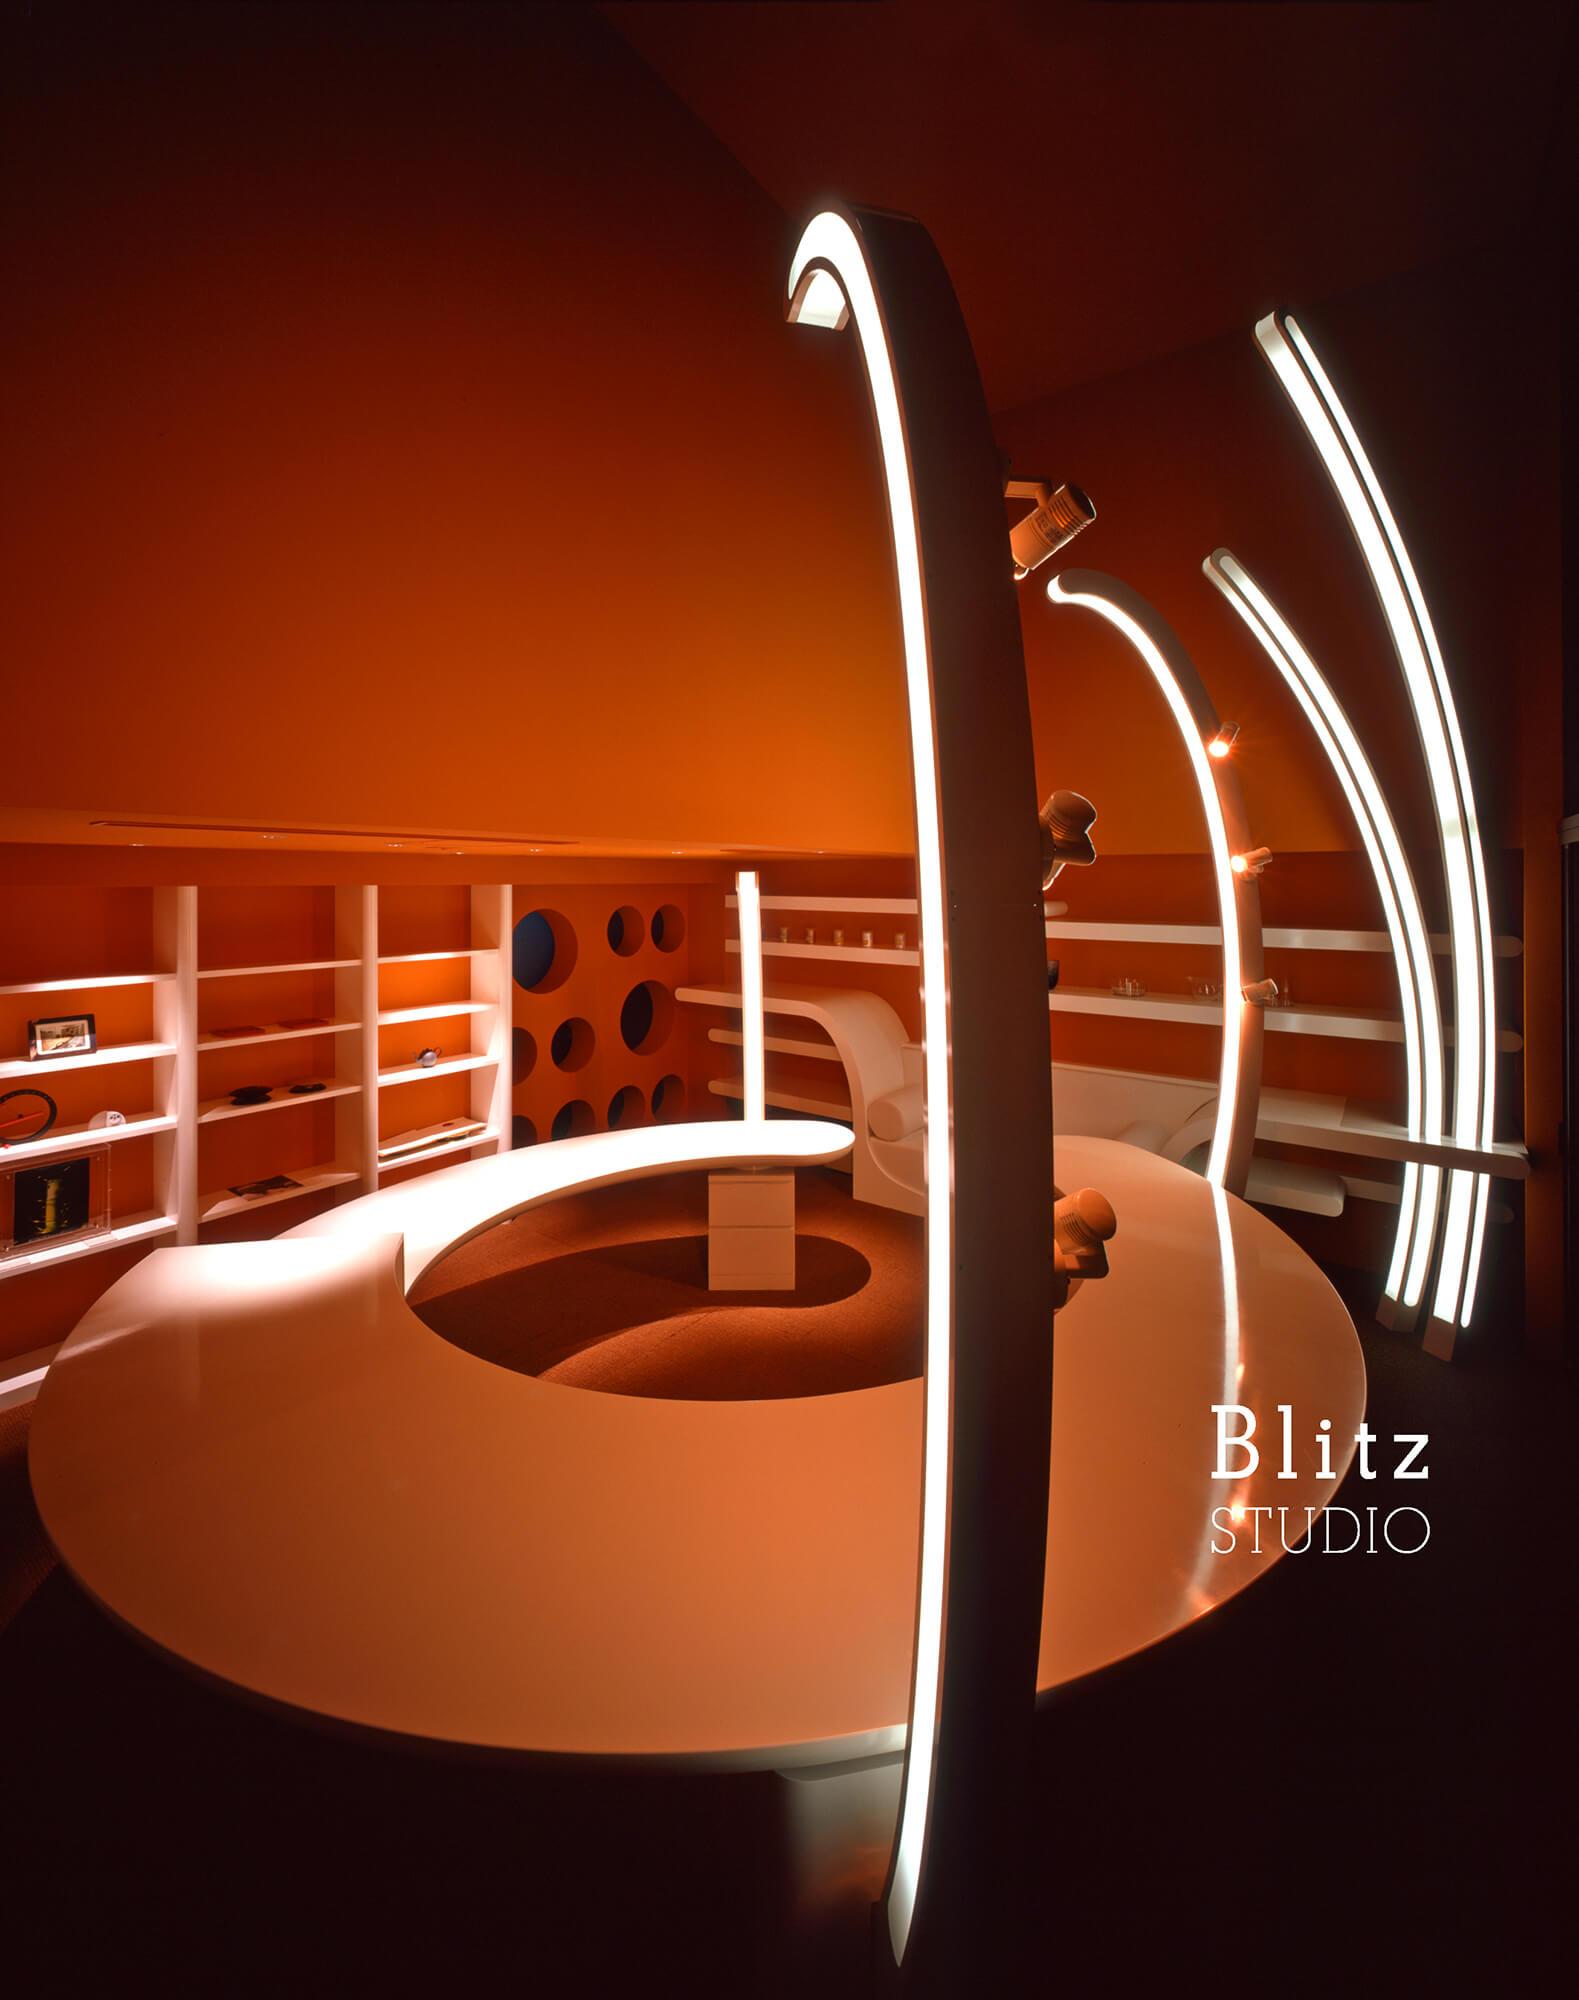 『shu uemura aoyama atelier シュウ ウエムラ青山アトリエ』-東京都-建築写真・竣工写真・インテリア写真5